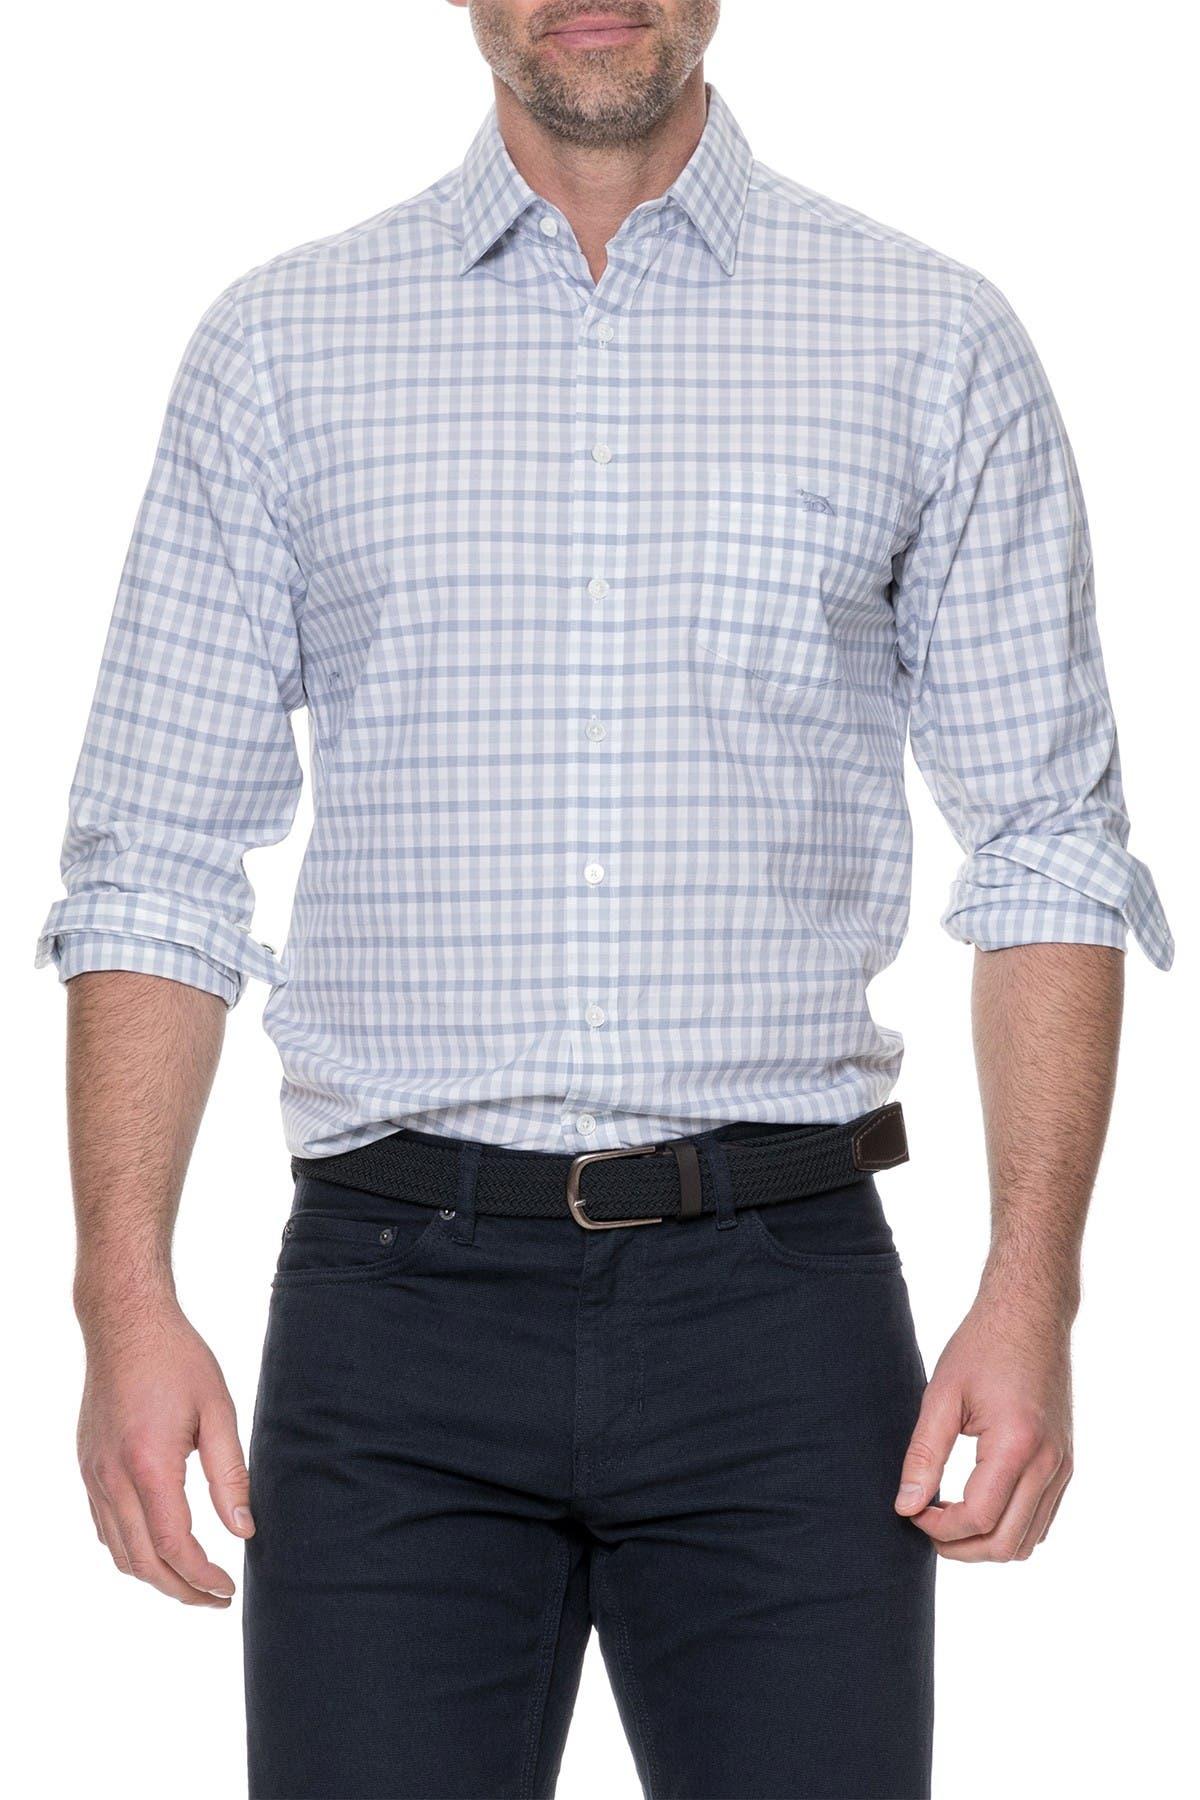 Image of RODD AND GUNN Shorecliffe Regular Fit Gingham Sport Shirt